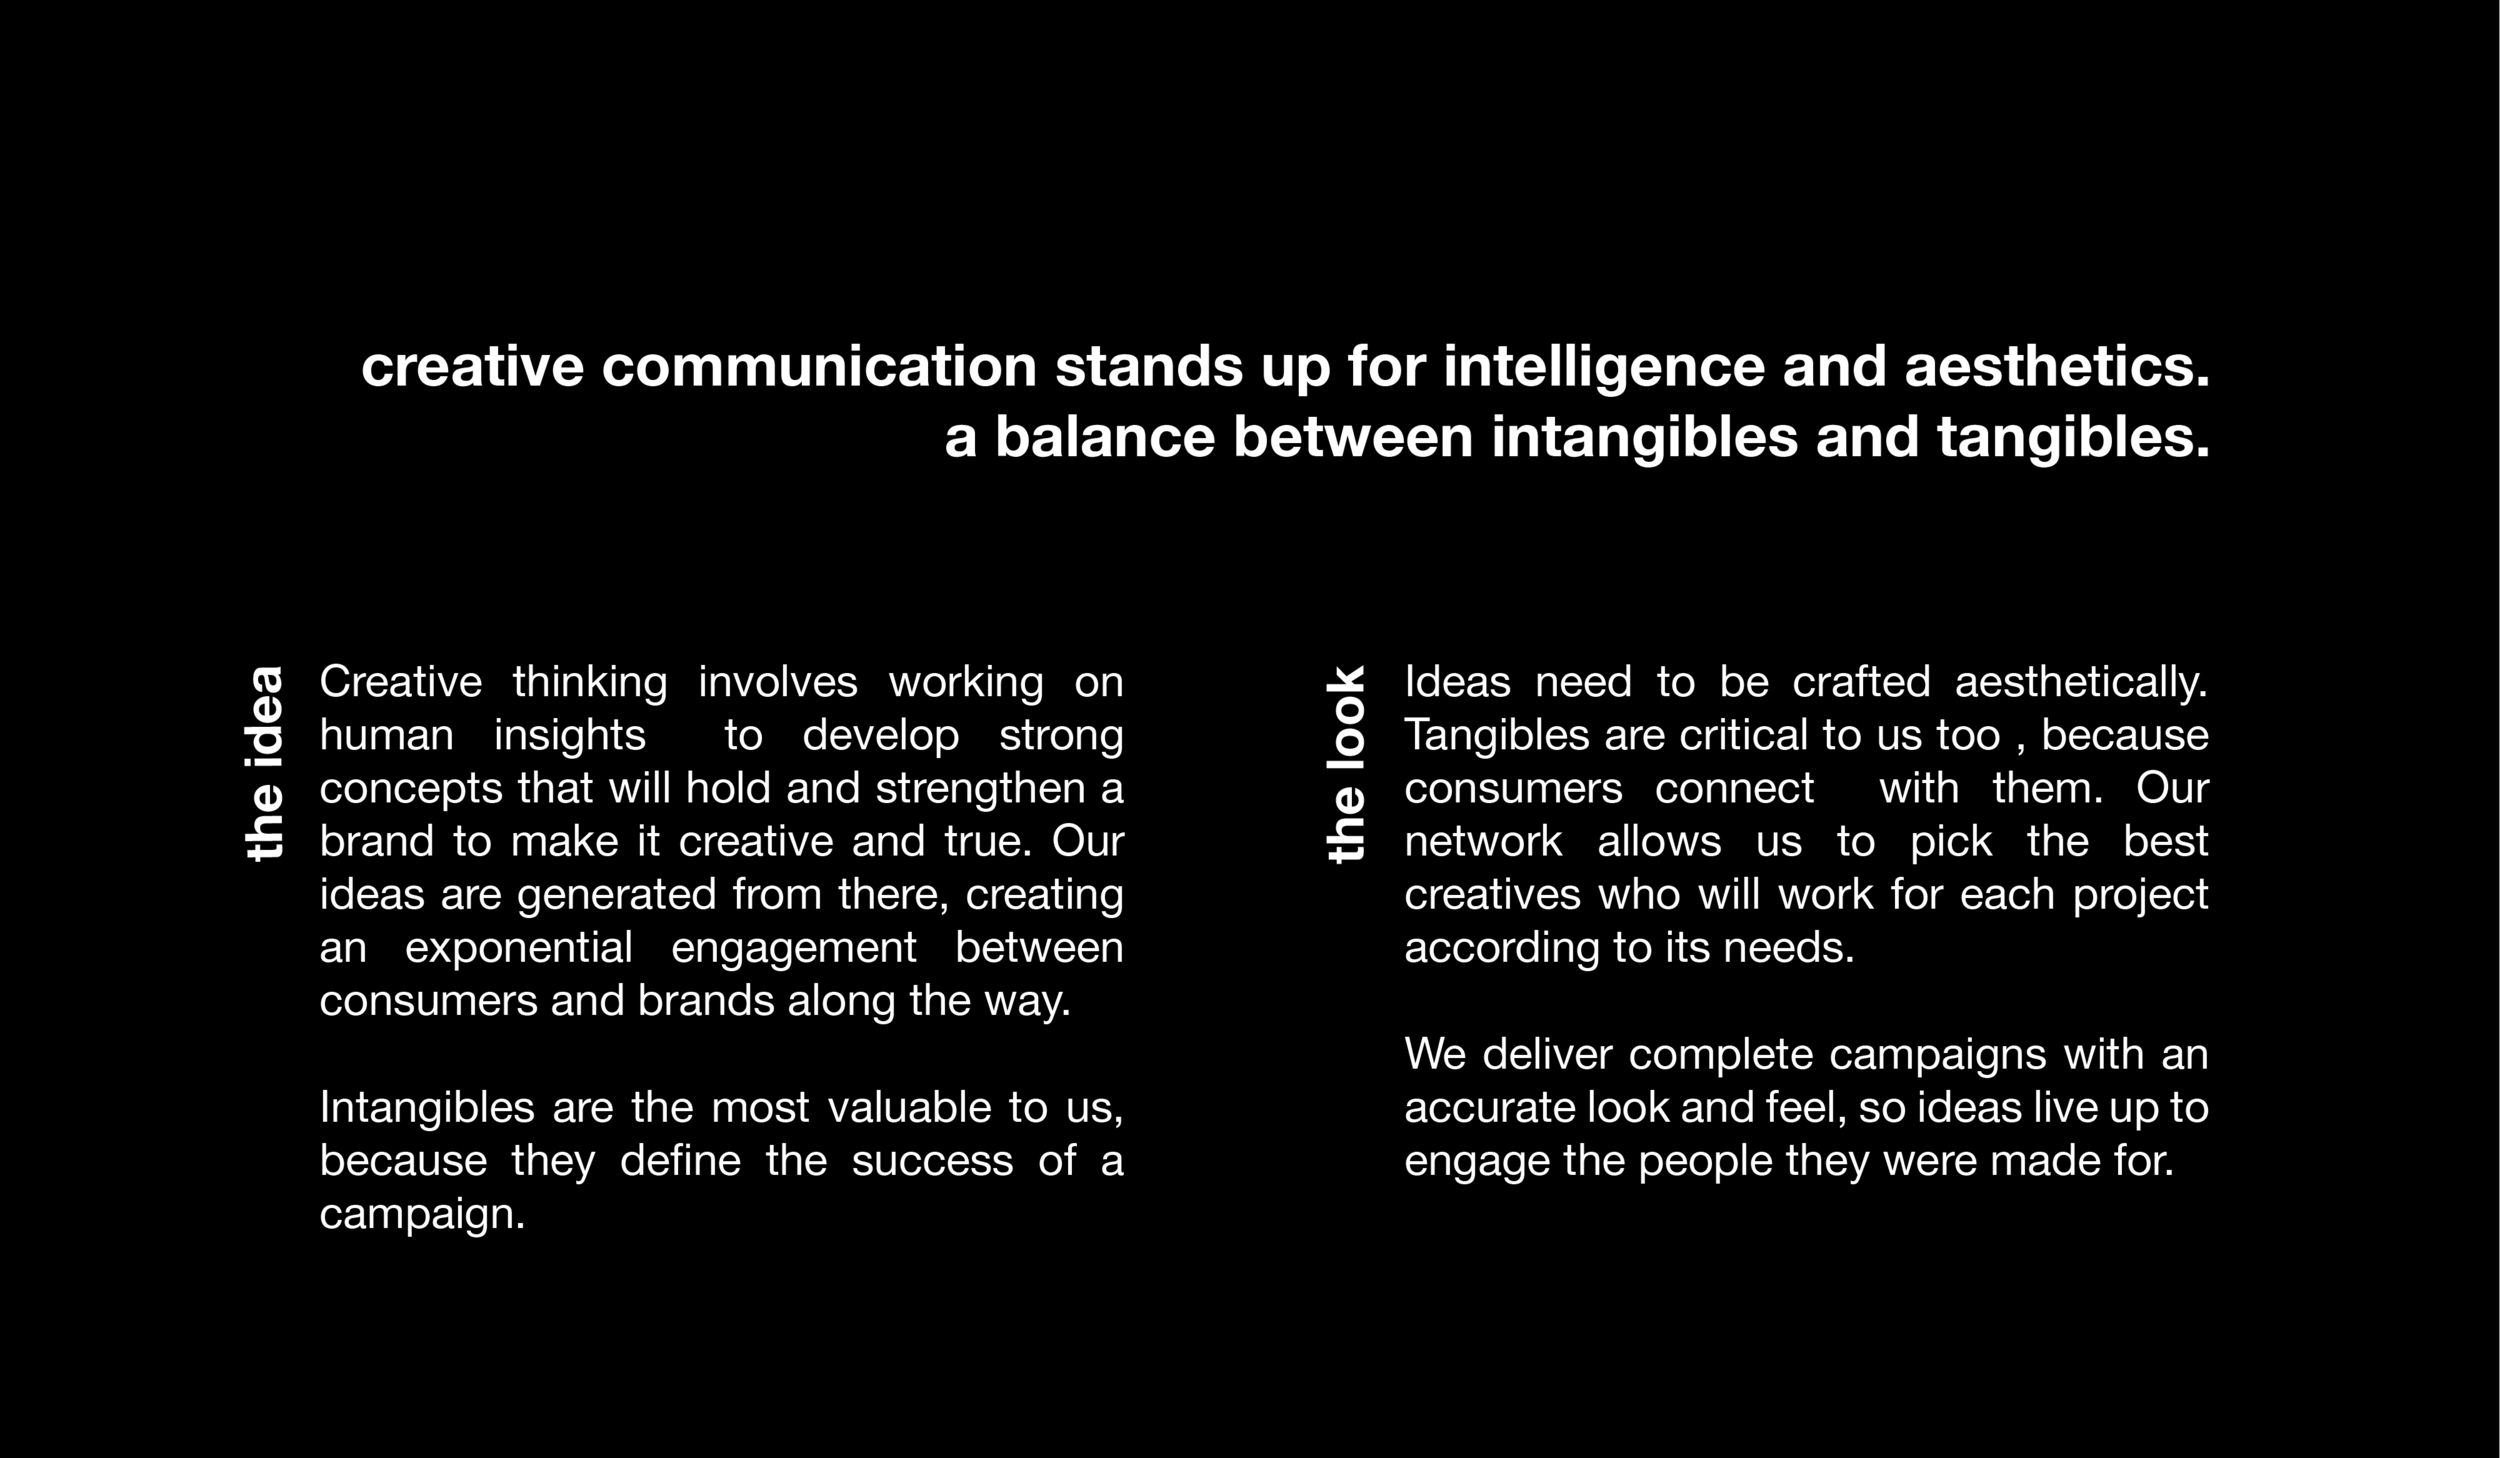 creativecommunication.png